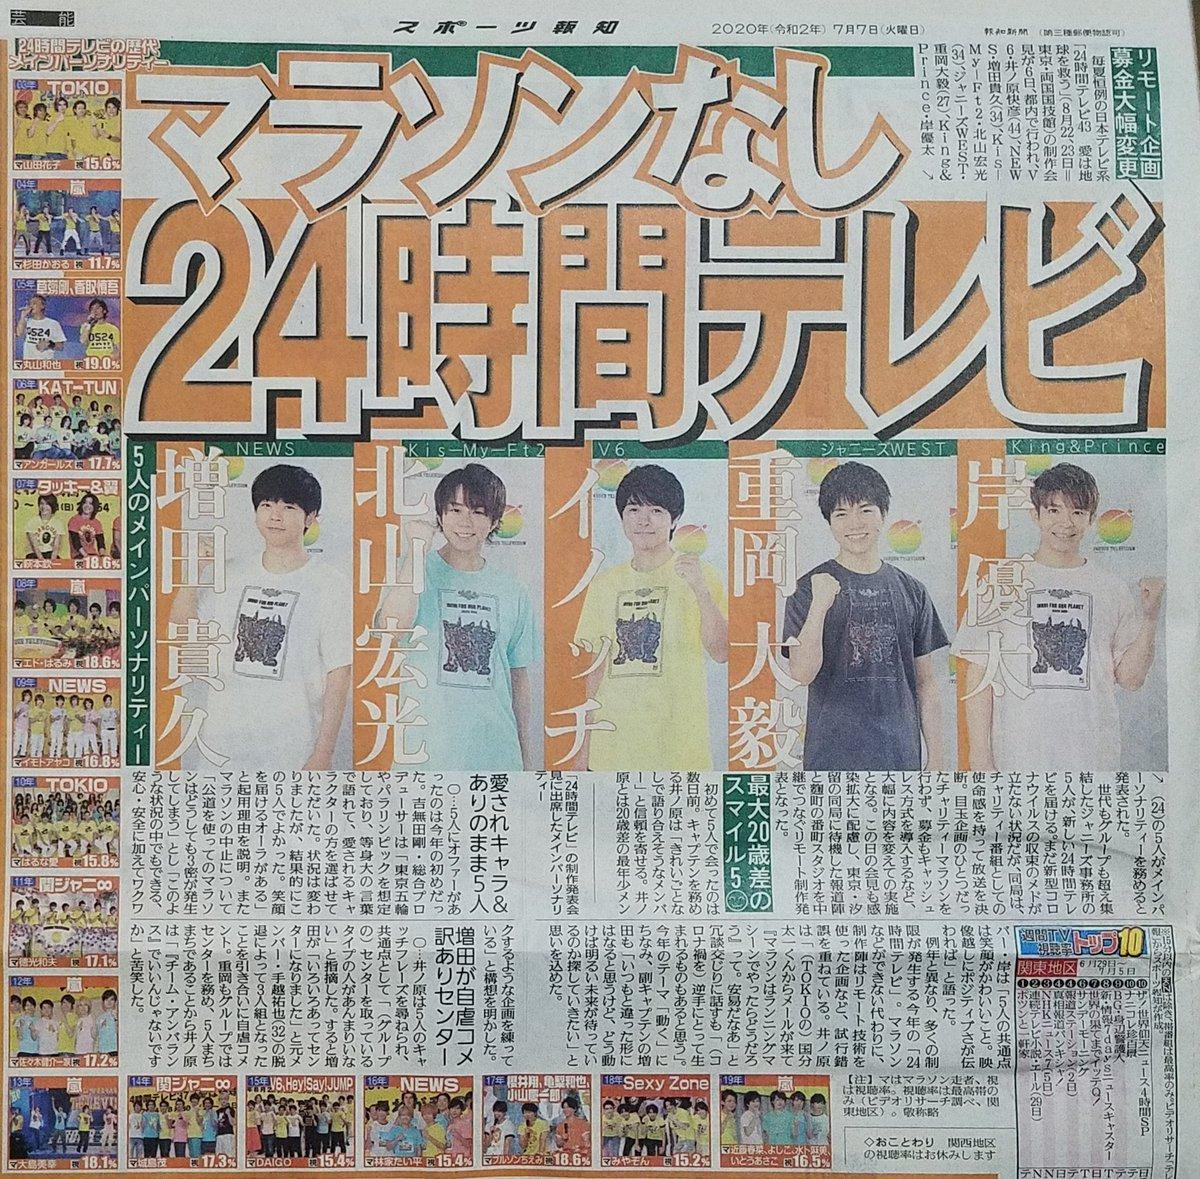 大 重岡 24 テレビ 毅 時間